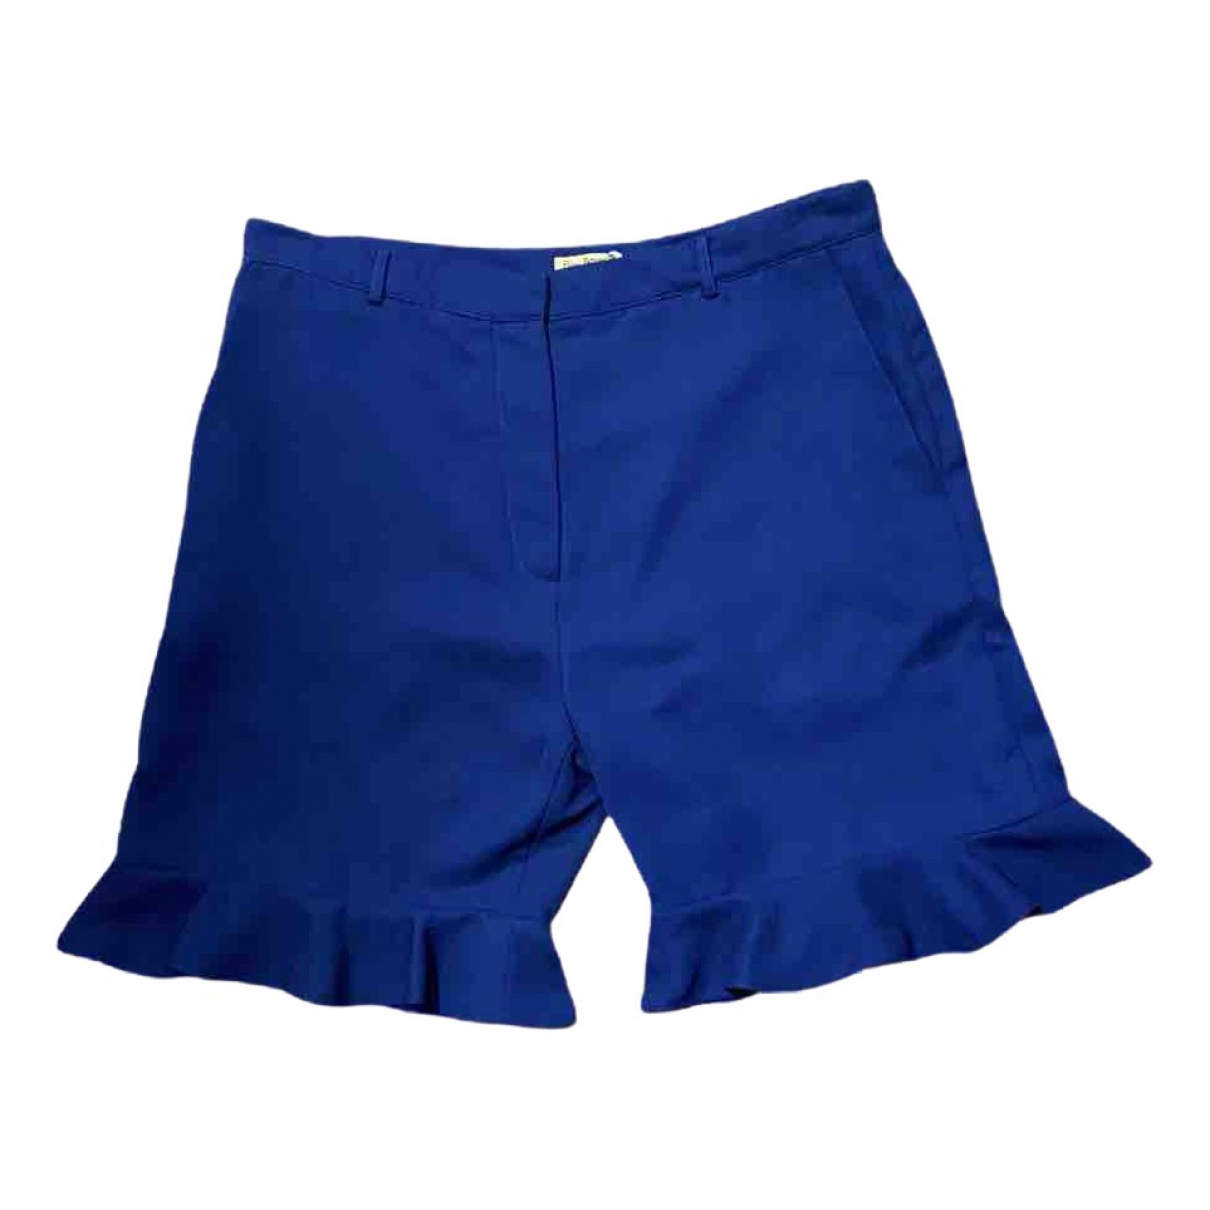 Peter Jensen \N Shorts in  Blau Polyester